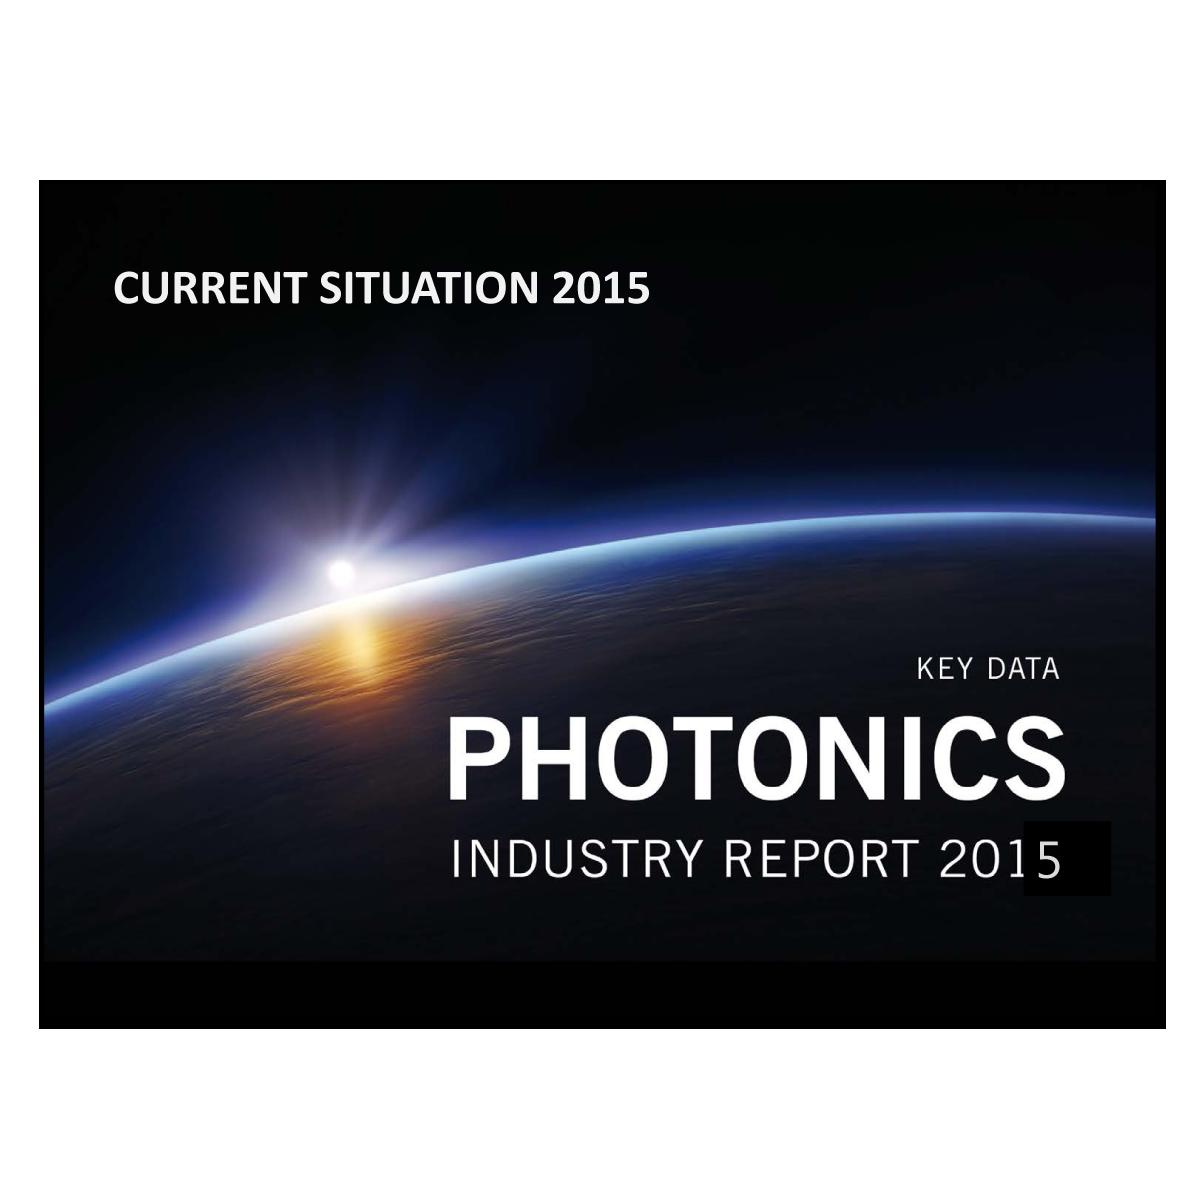 Photonics Industry Report 2015